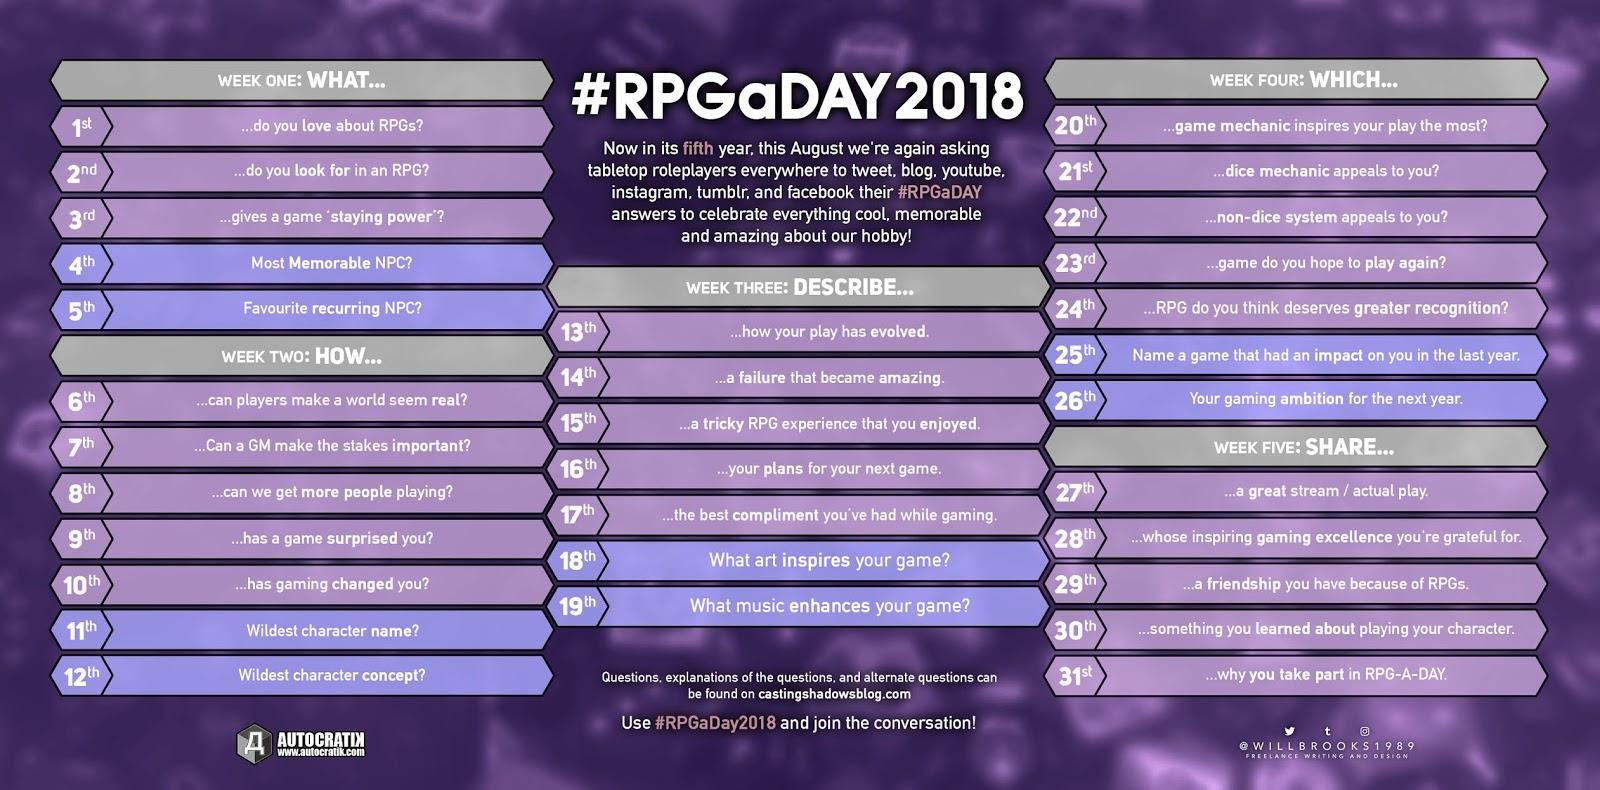 RPG-a-Day 2018